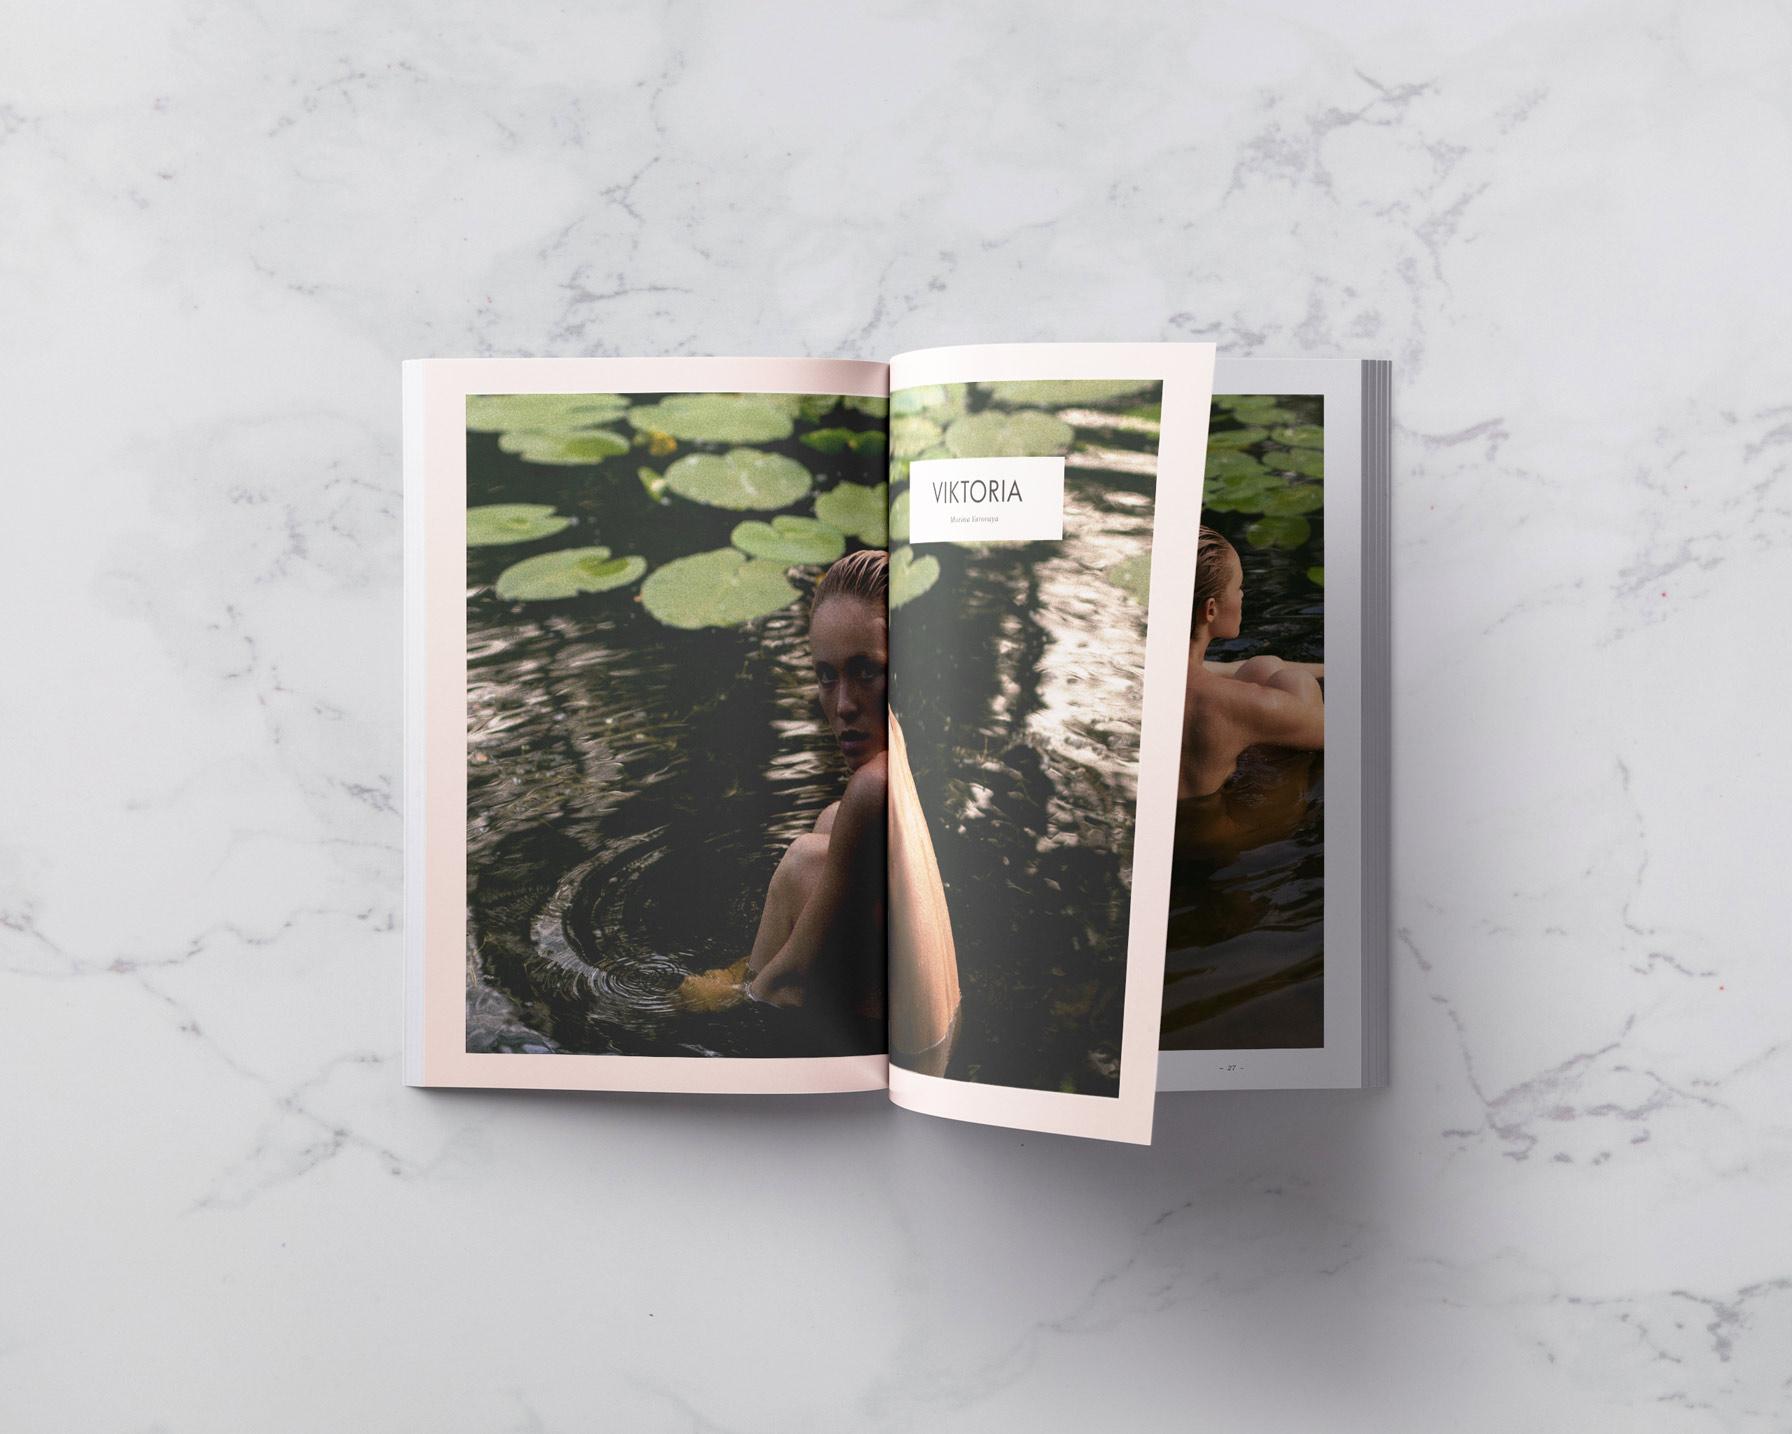 Viktoria Yarova in the lake with lotus